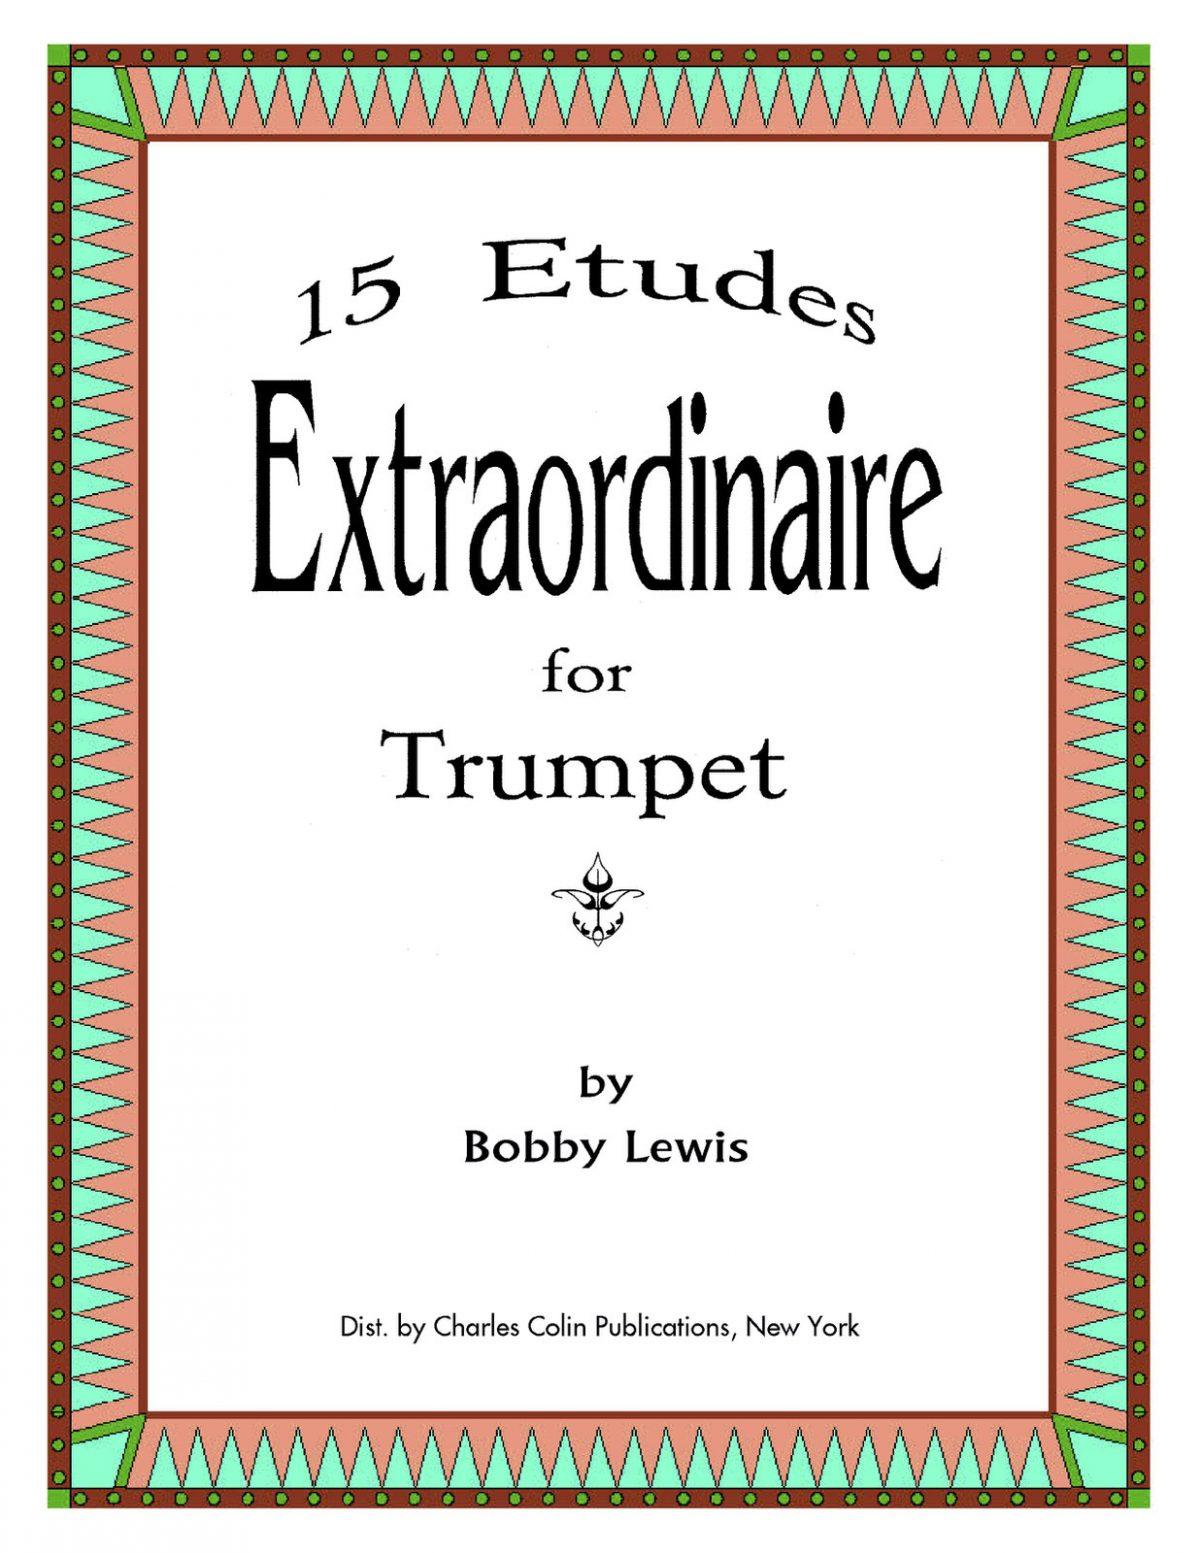 Lewis, Bobby,15 Etudes